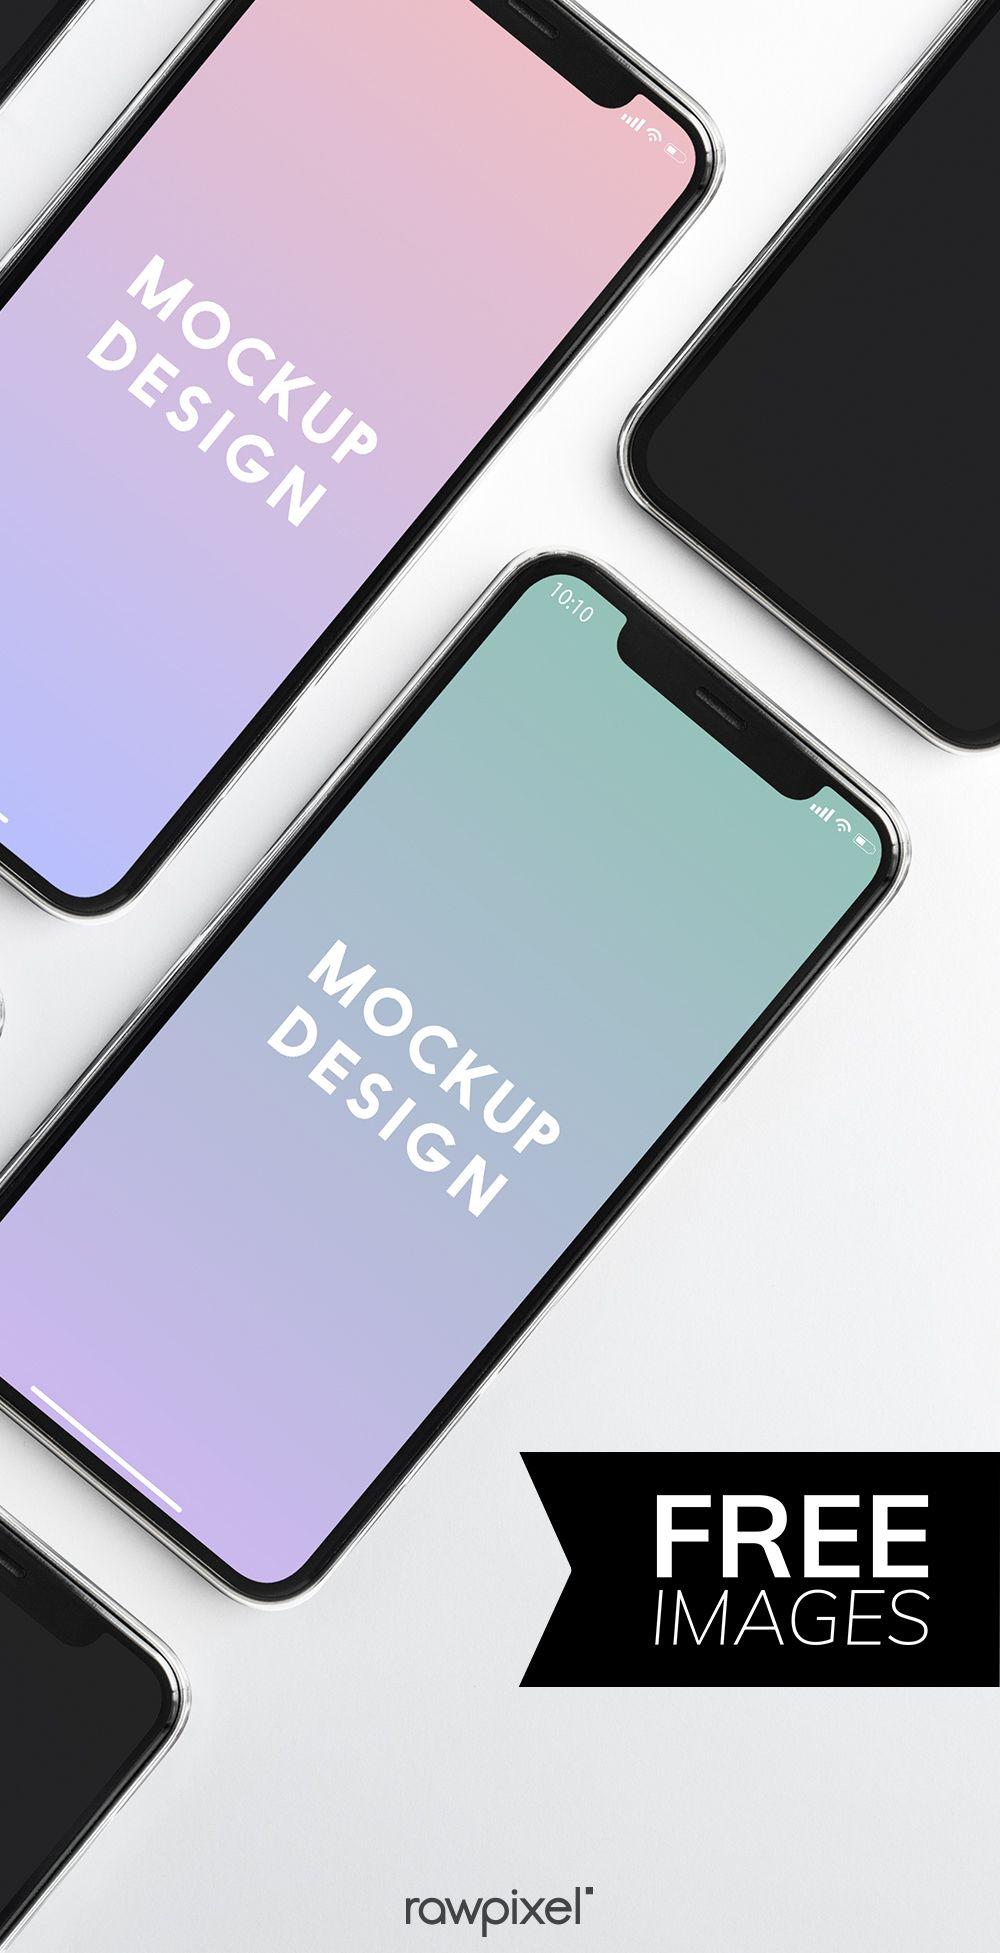 Download Download Premium Psd Of Premium Mobile Phone Screen Mockup Template 527608 Web Design Quotes Phone Mockup Free Mobile Phone